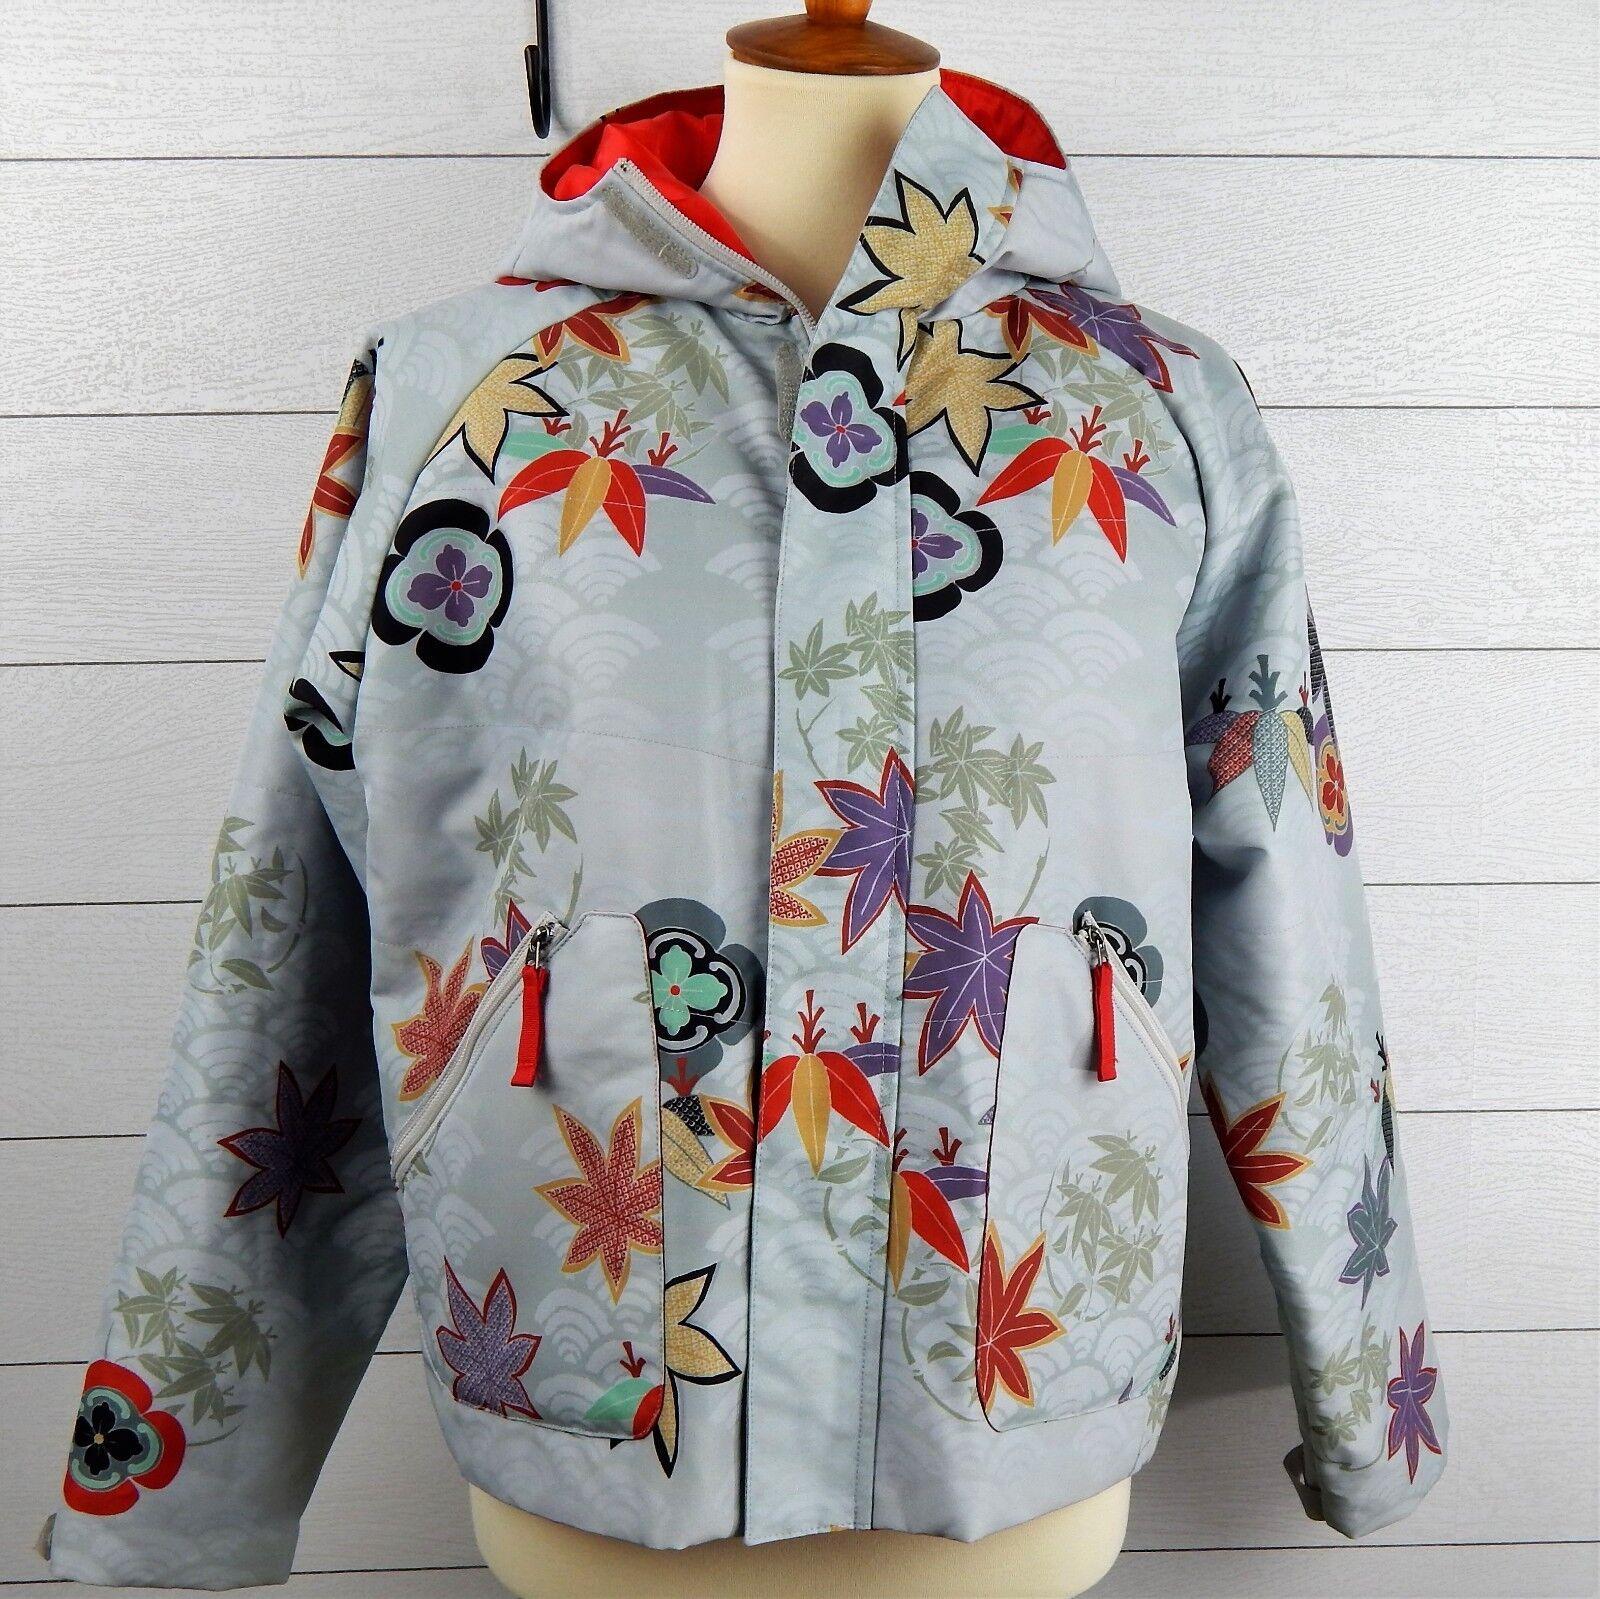 Gelanots Womens Multi-color Floral Pattern Hidden Zip-up Winter  Sports Ski Coat  save 50%-75%off